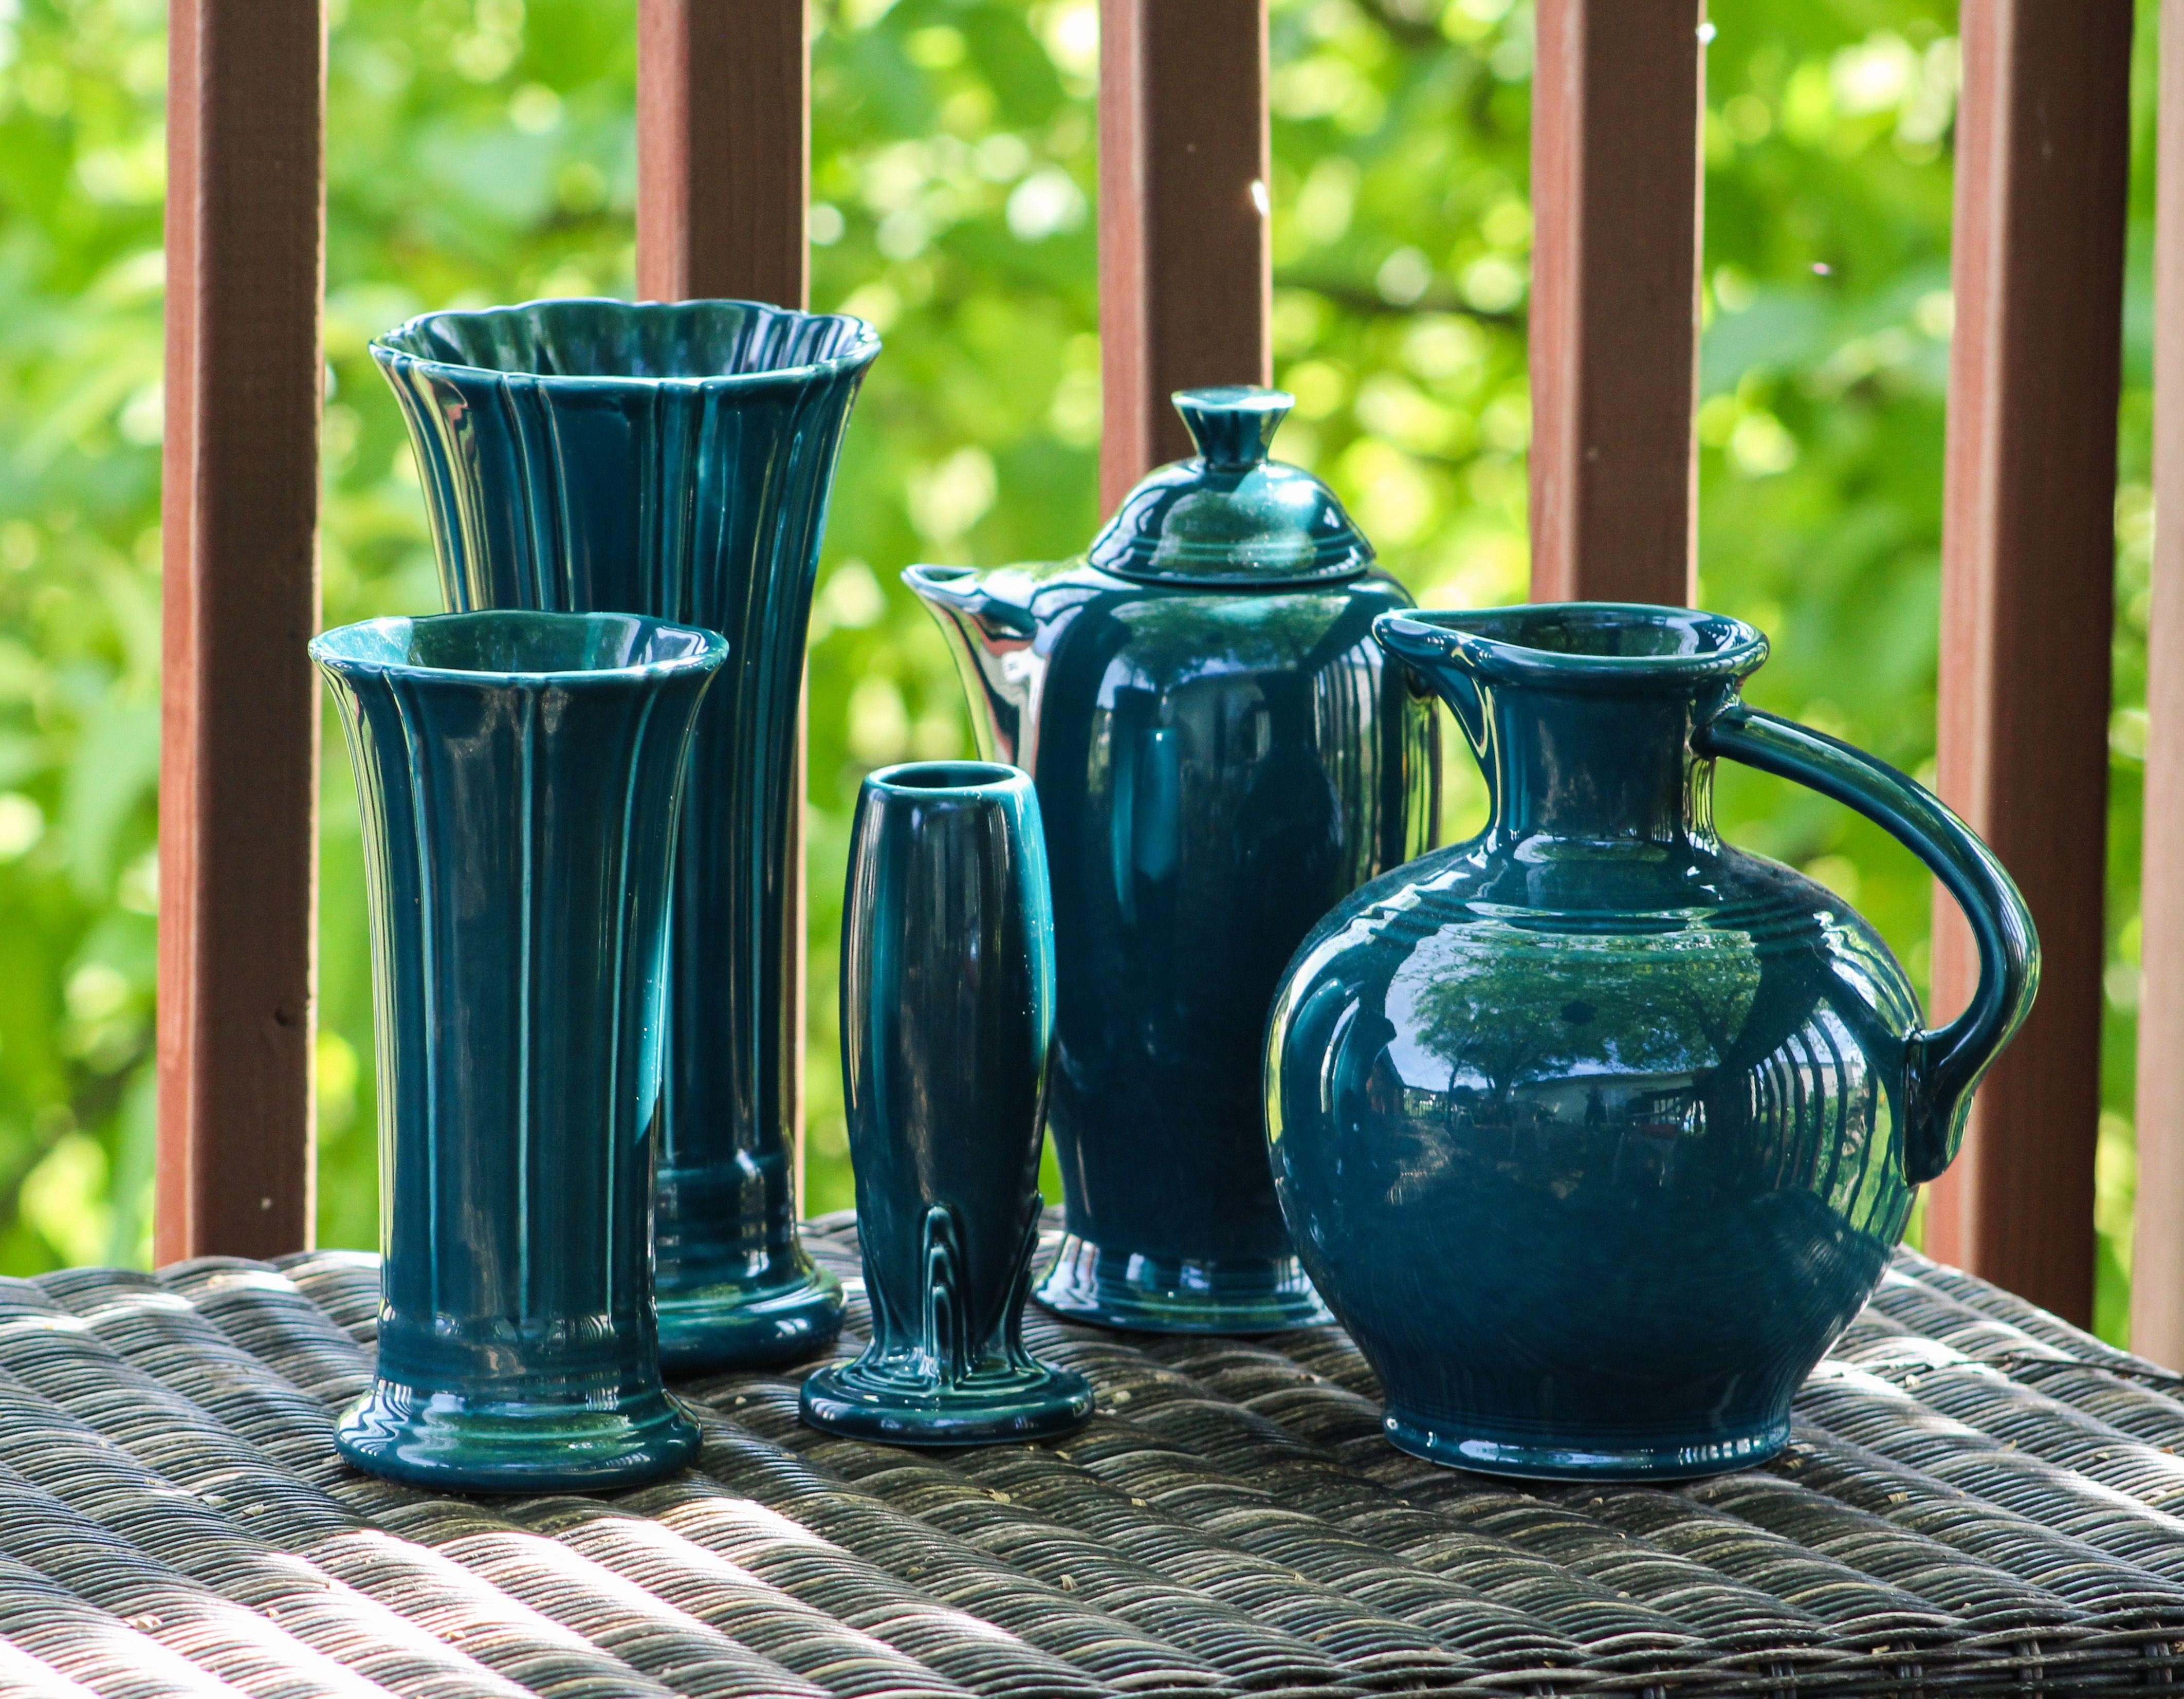 fiesta juniper medium small bud vases coffee carafe carafe t fiesta pinterest on kitchen decor pitchers carafes id=68120